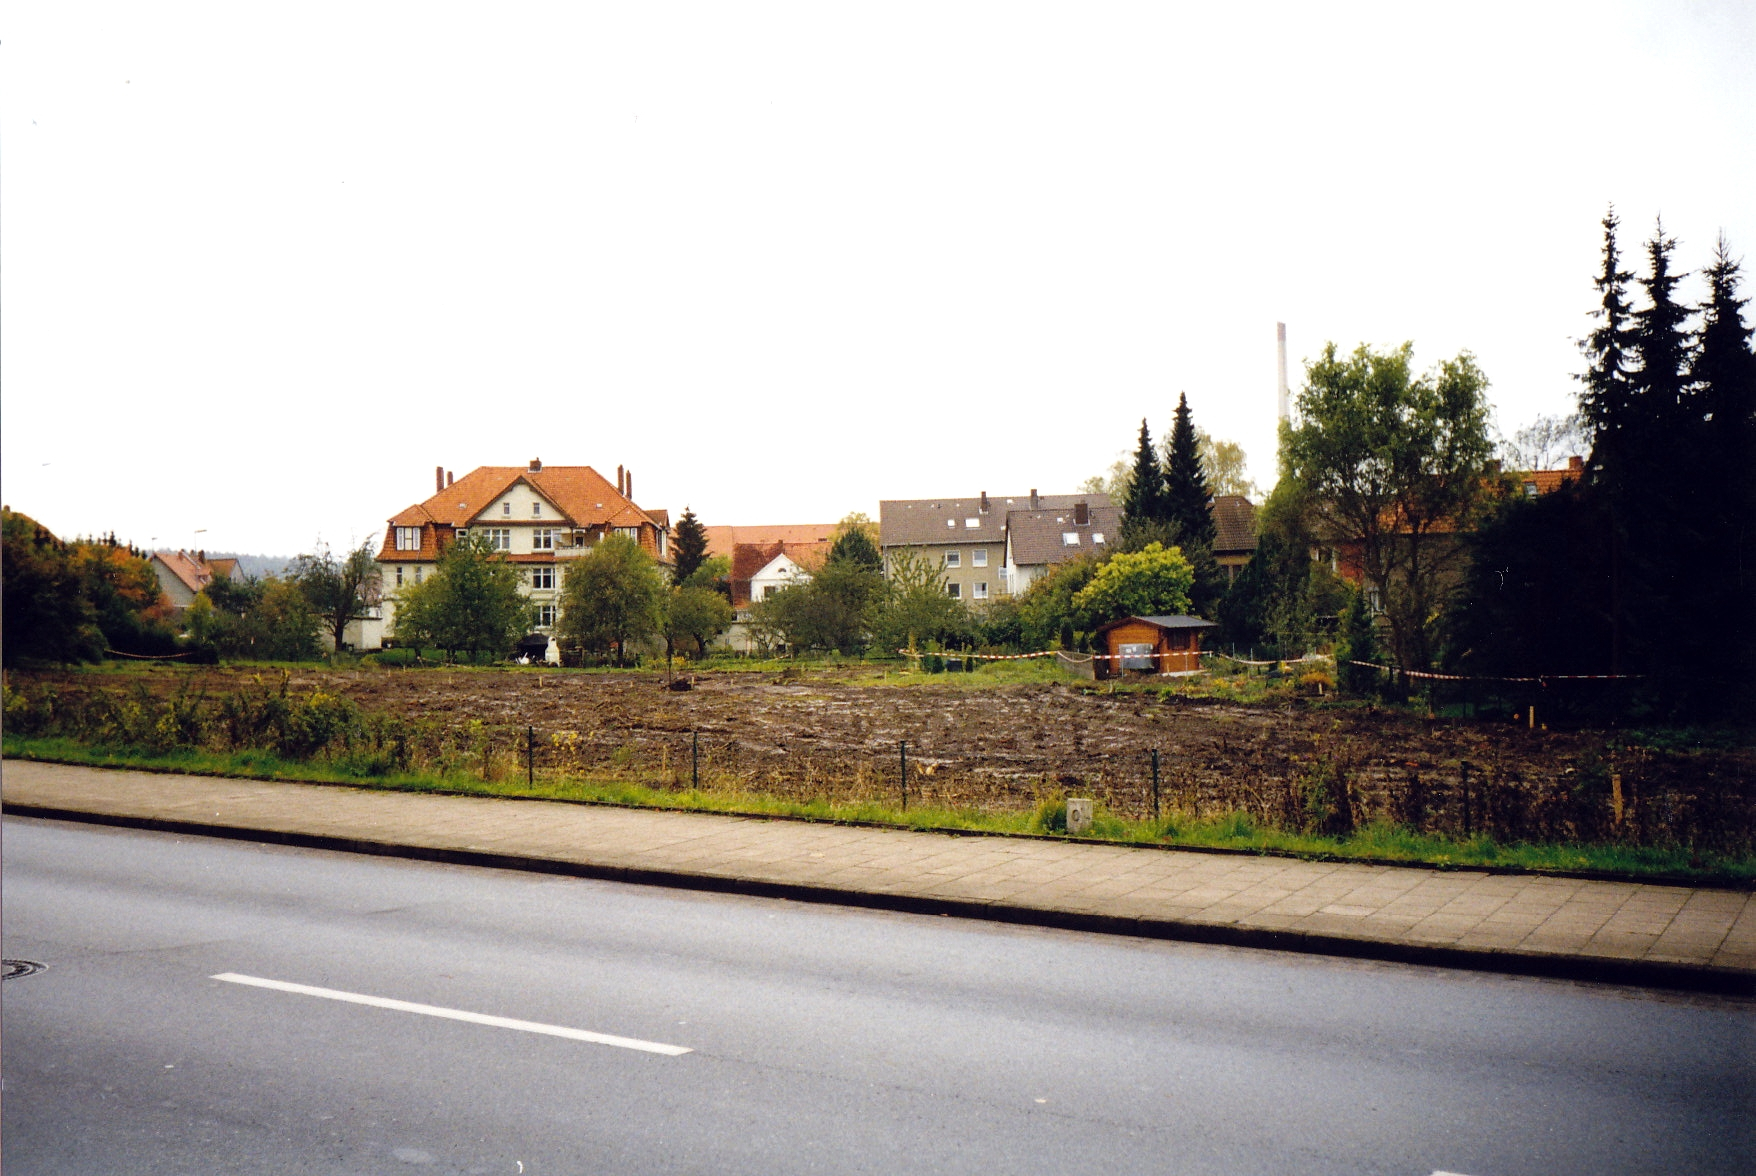 Gropiusring1998-01-Bauplatz-Reihenhaussiedlung